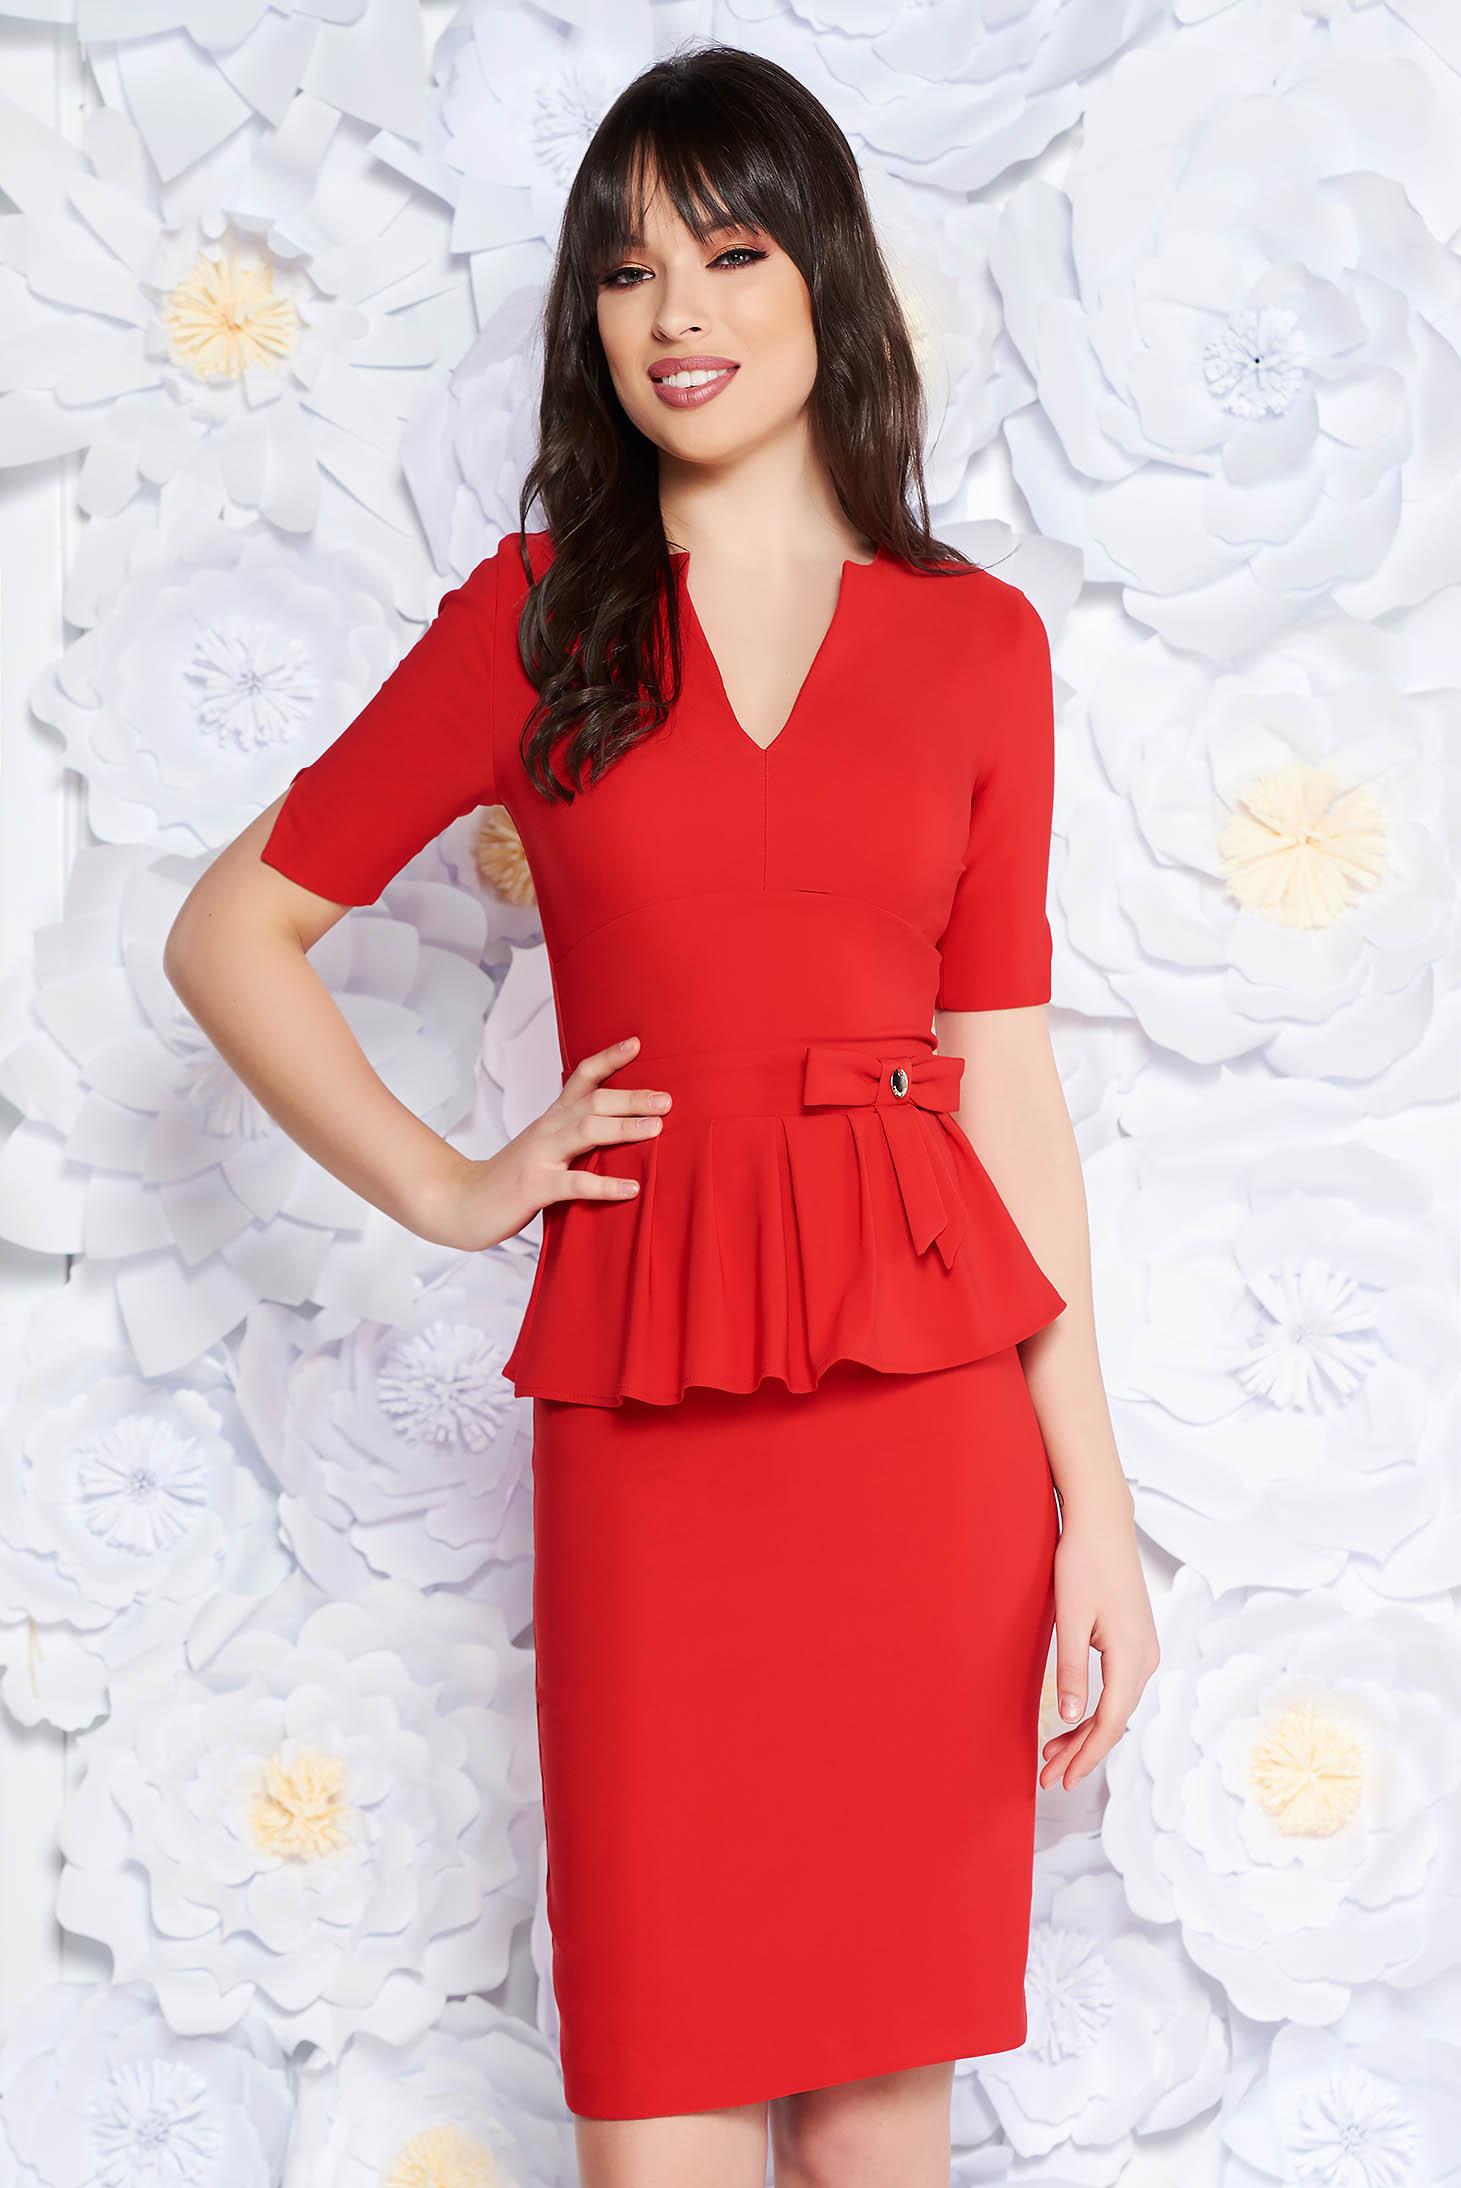 PrettyGirl red elegant midi pencil dress frilled slightly elastic fabric with inside lining